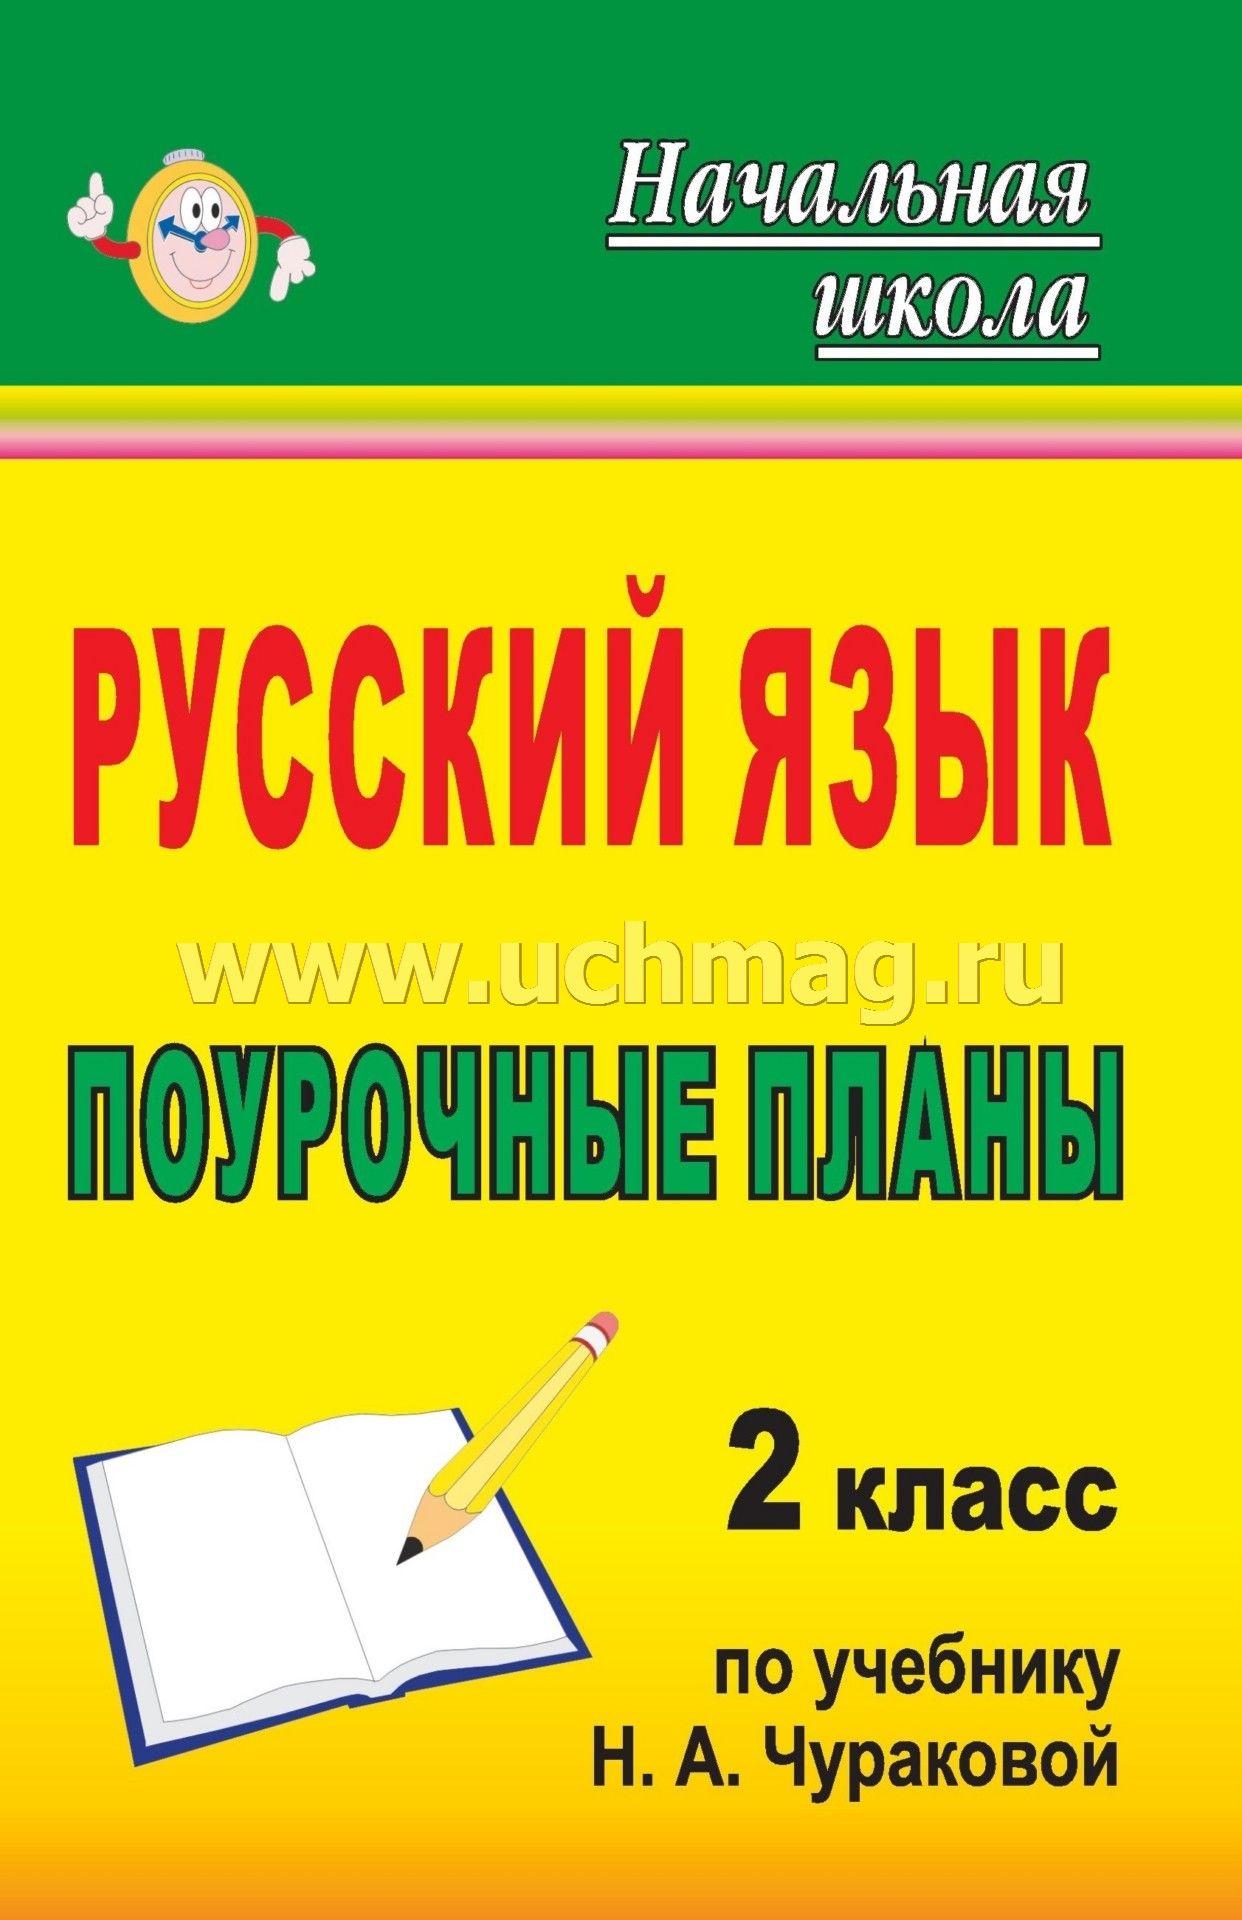 2019 языку чураковой н.а. русскому класса по 2 гдз